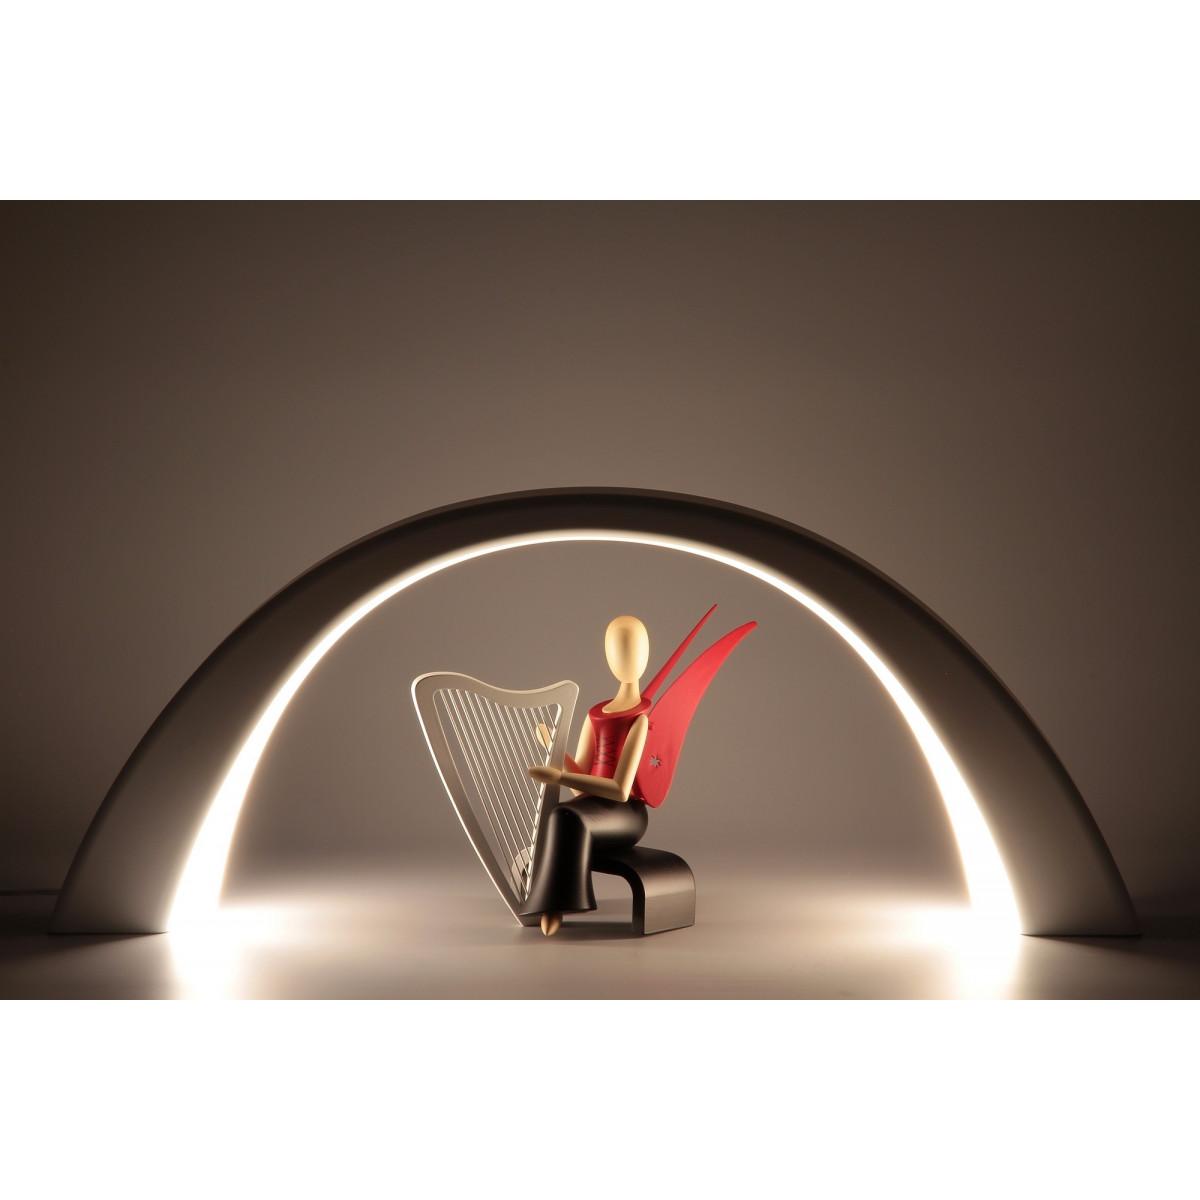 led lichterbogen schwibbogen mit innenbeleuchtung wei erzgebirgskunst drechsel. Black Bedroom Furniture Sets. Home Design Ideas